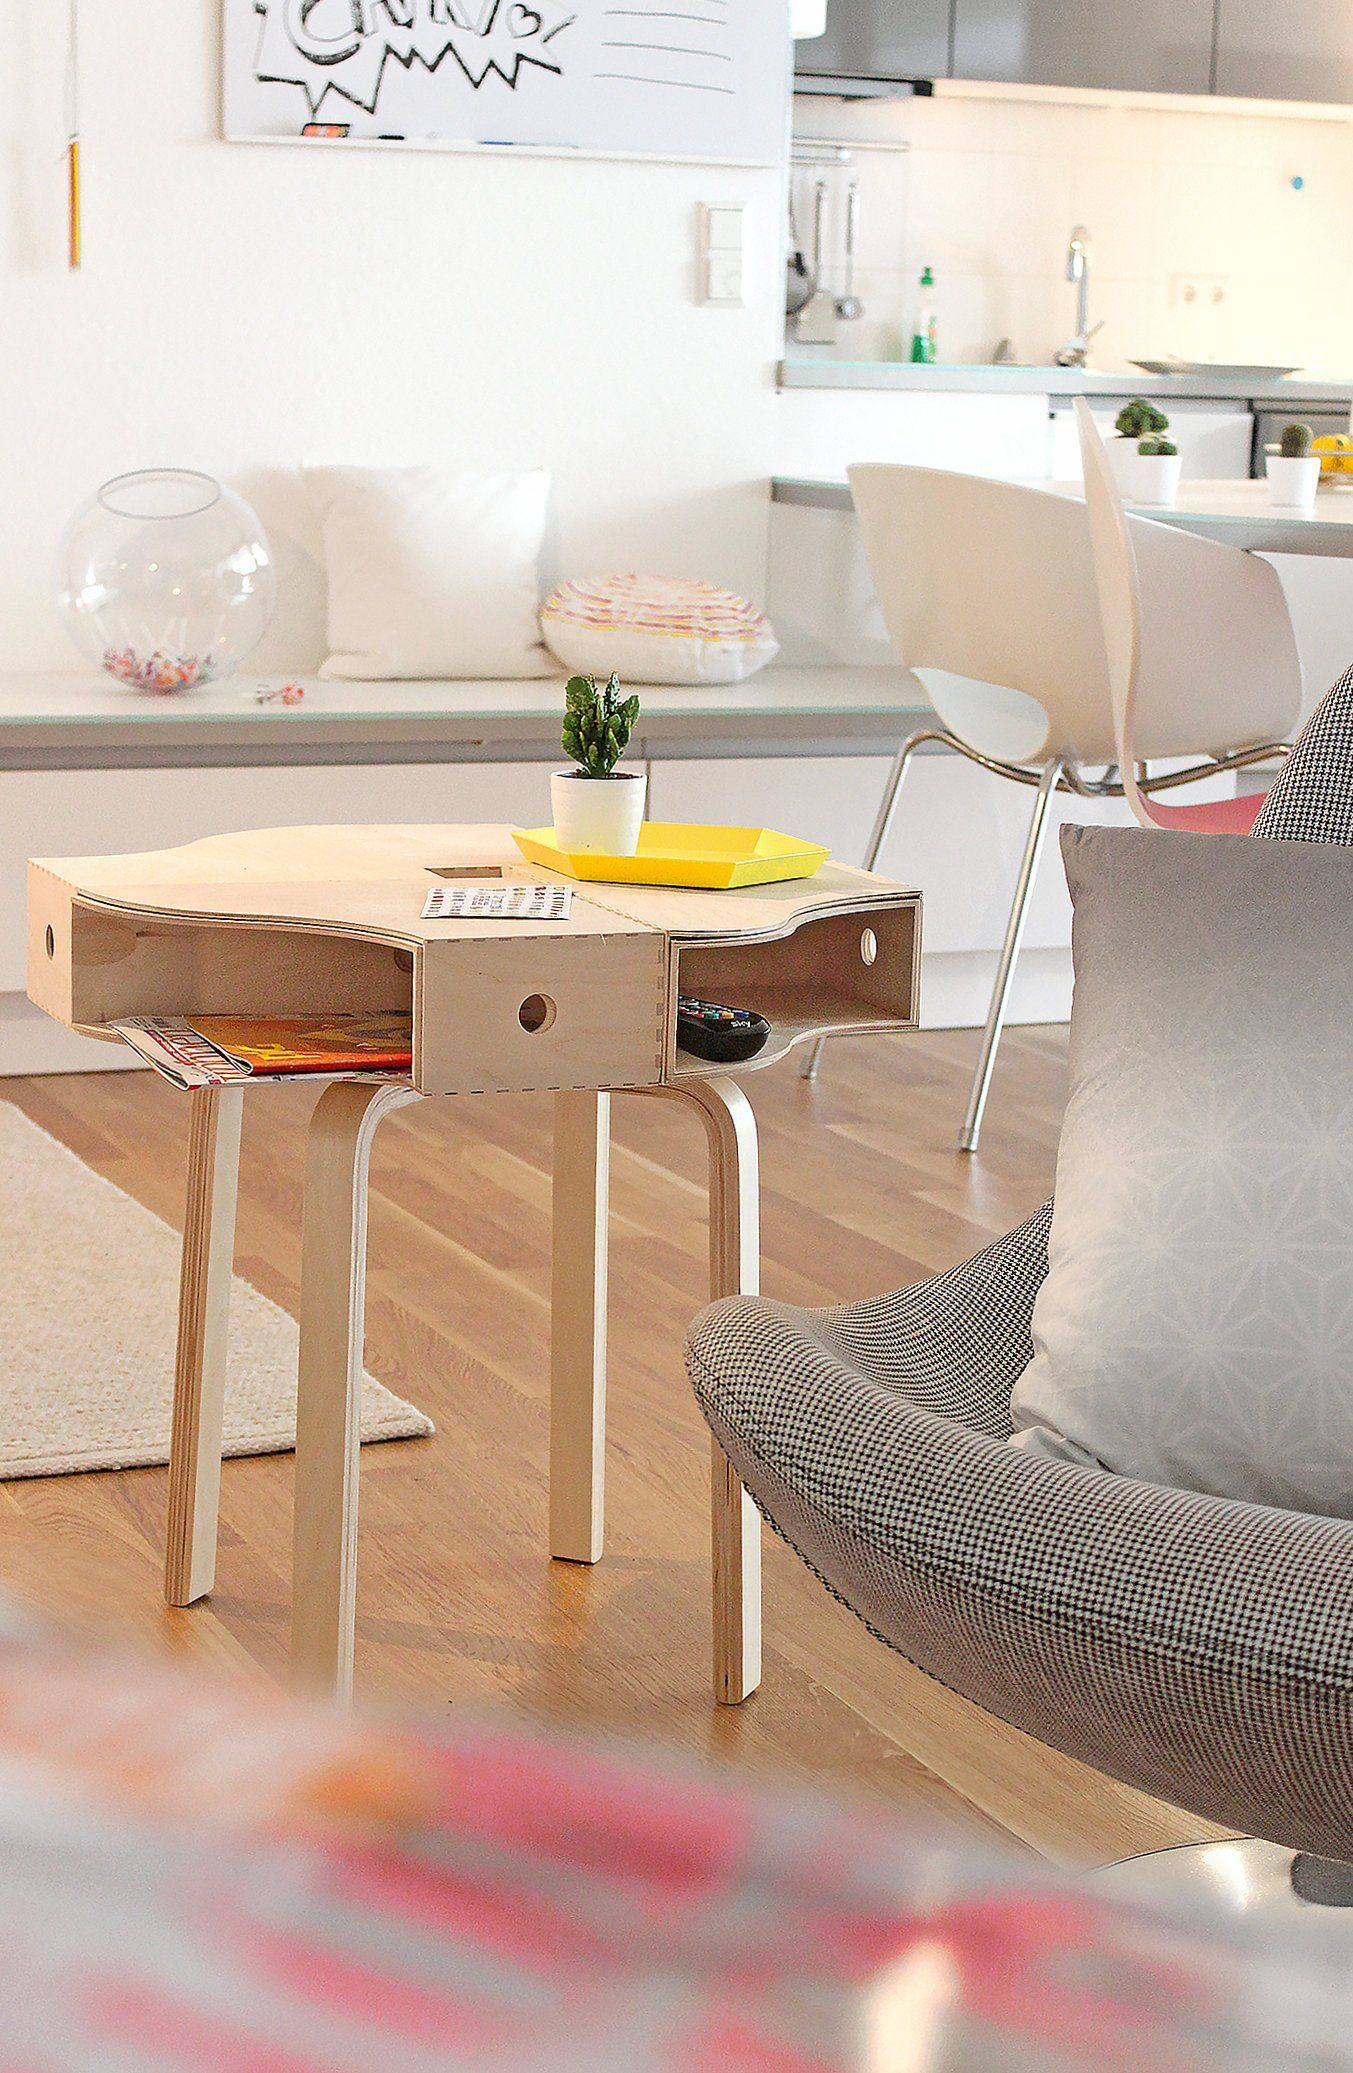 Schoner Stauraum 5 Einfache Ikea Hacks Solebich De